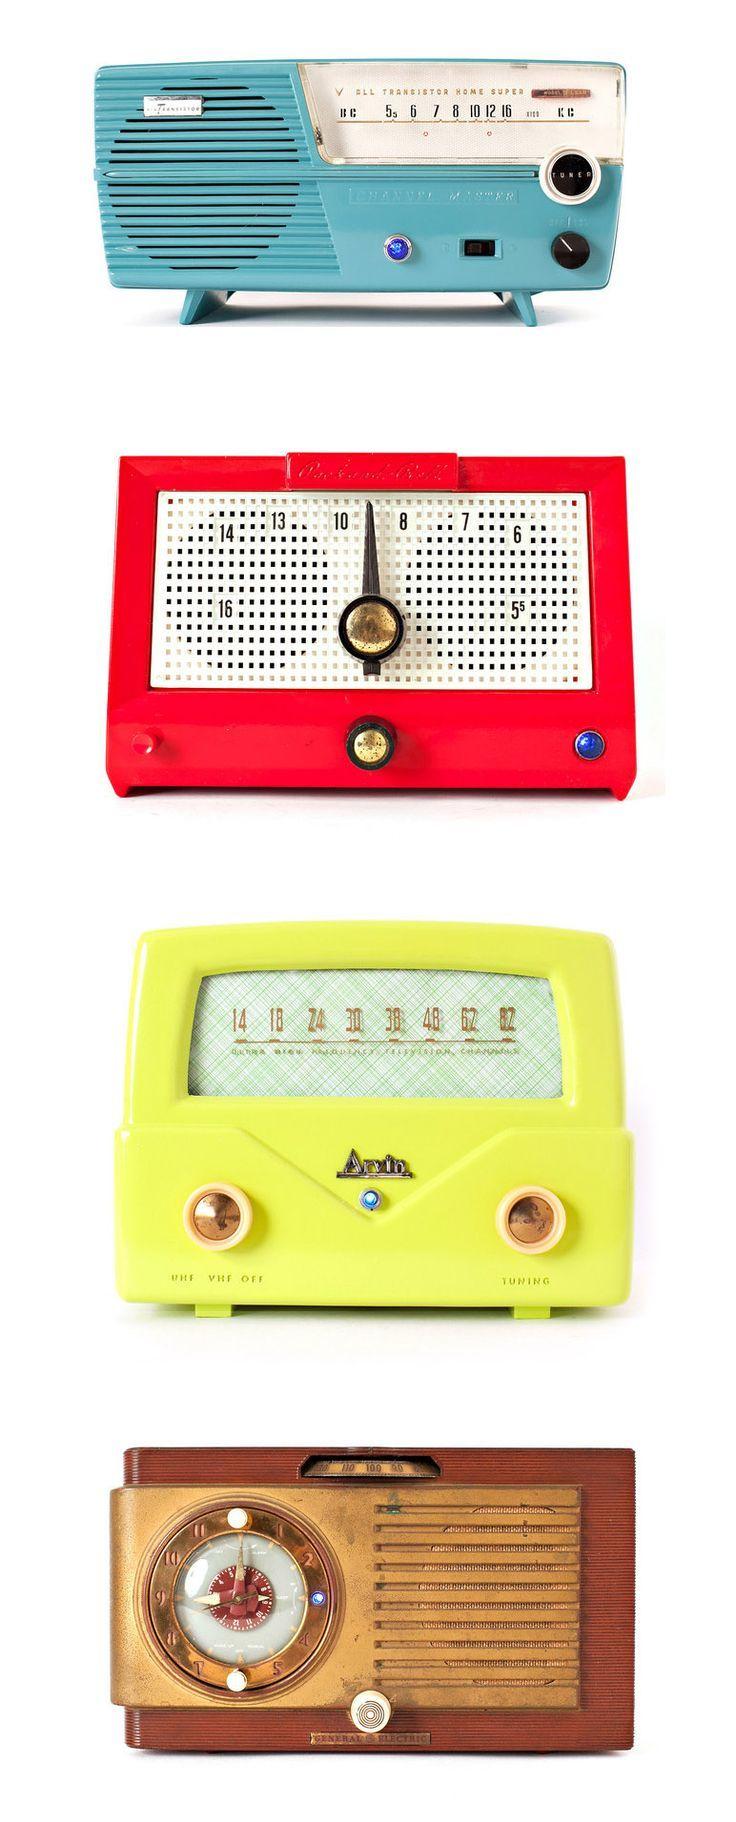 Mod Radio #midcenturymodern